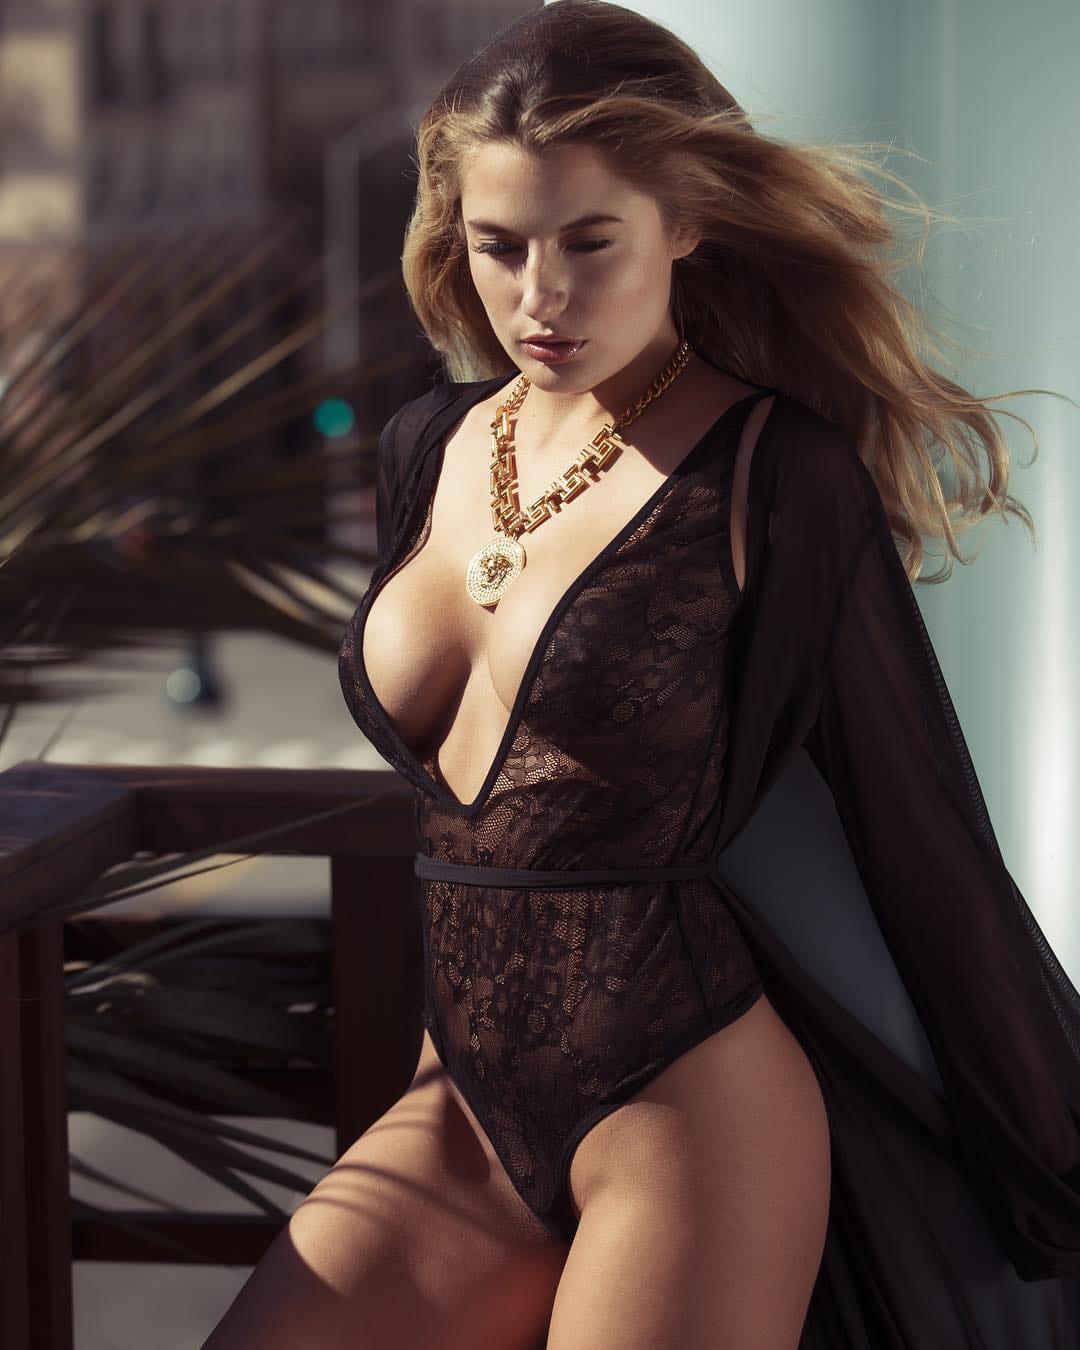 Cherie Noel Nude Photos 10